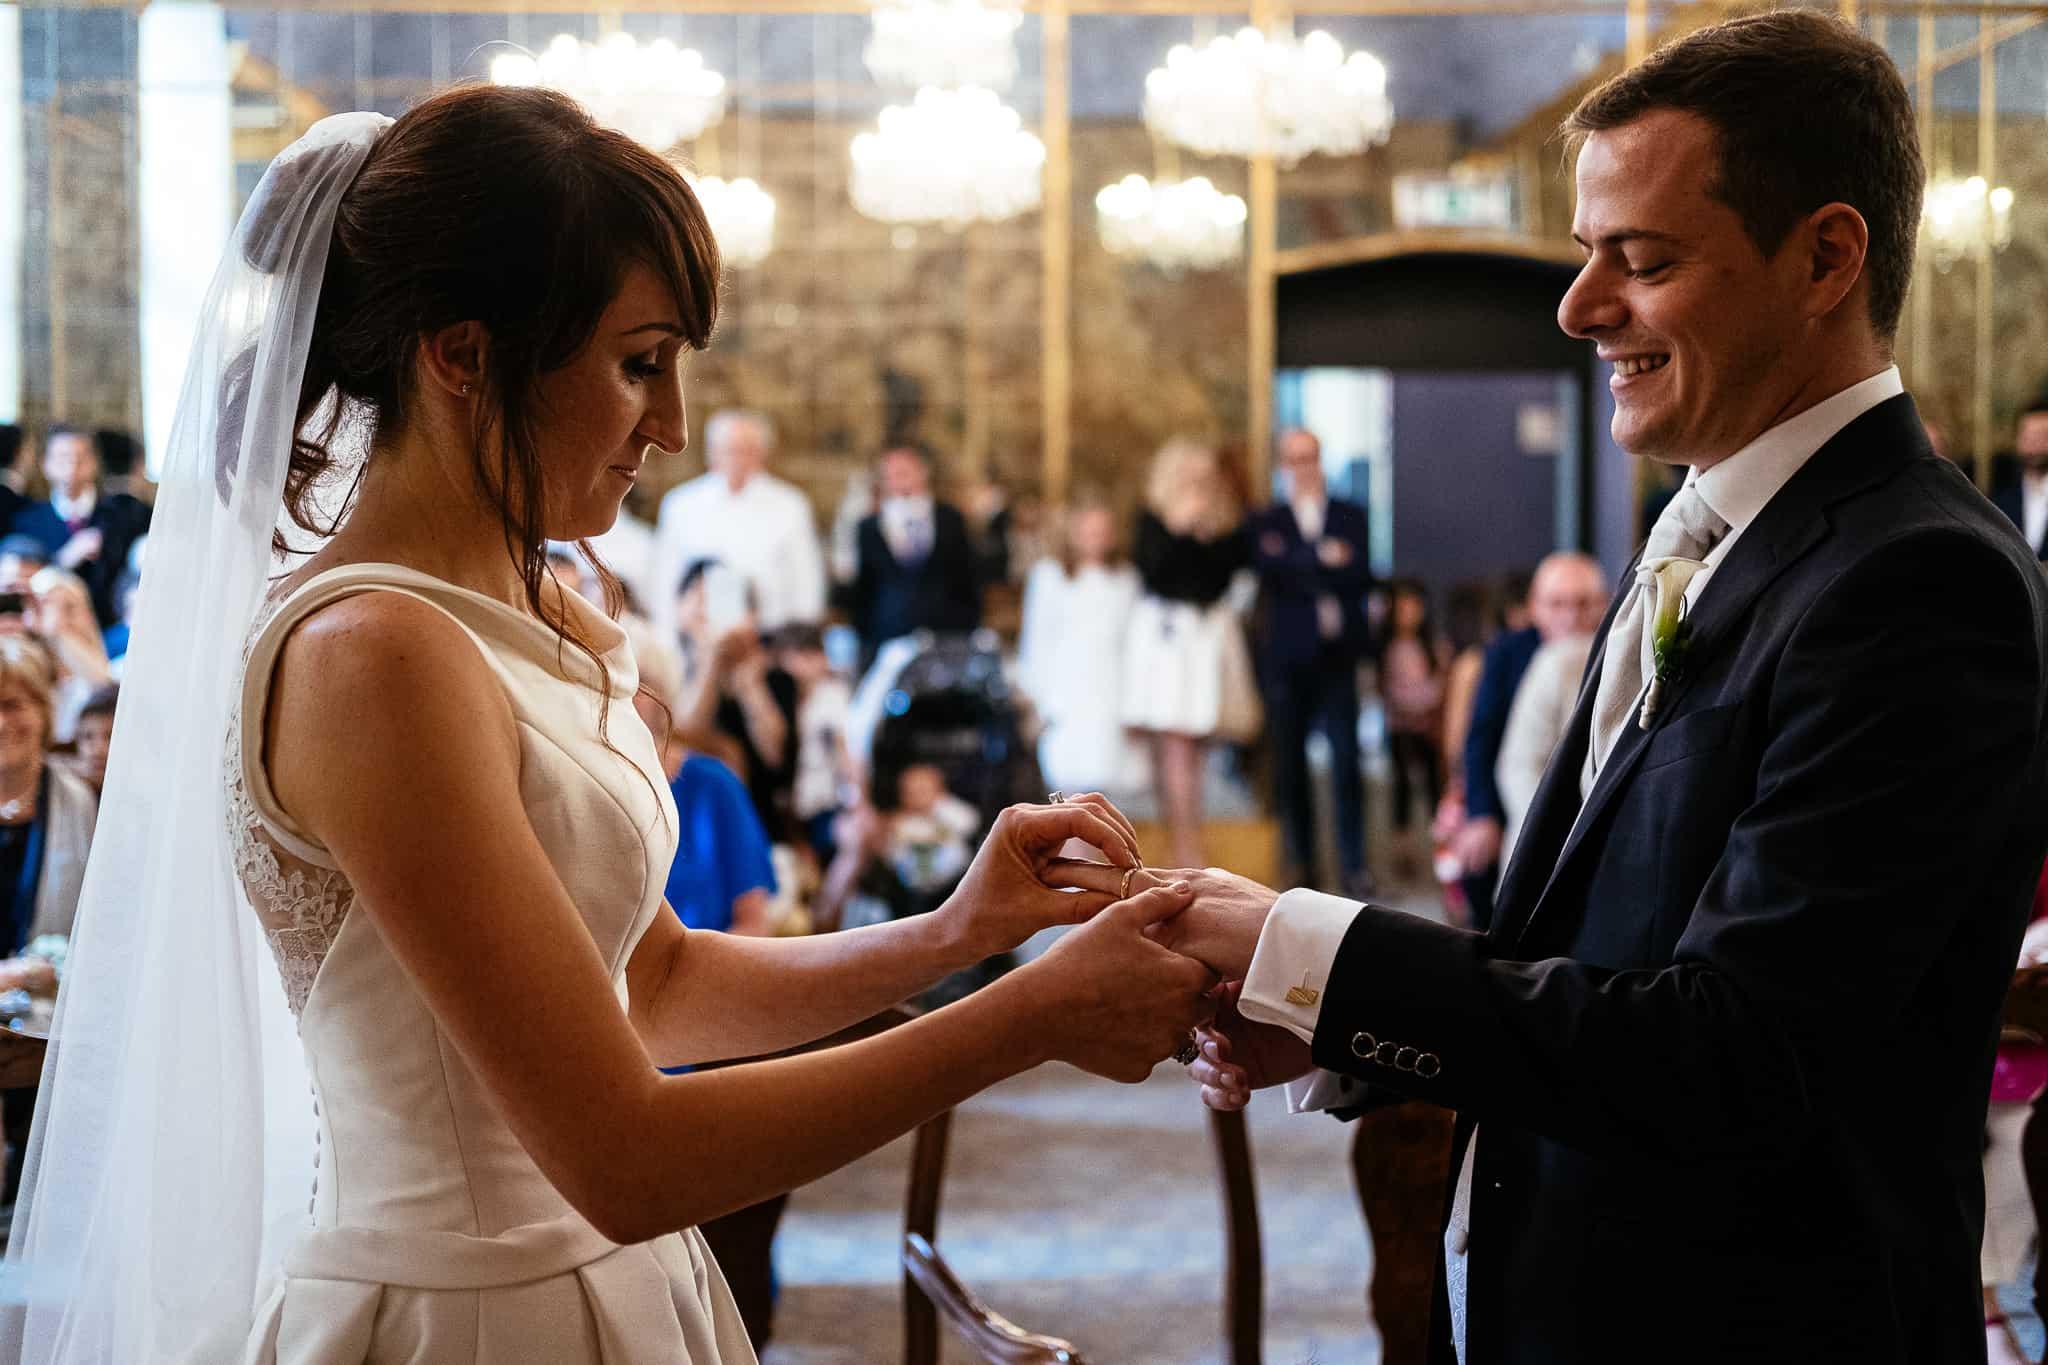 matrimonio Canter Milano San siro Luca rossi wedding reportage 0029